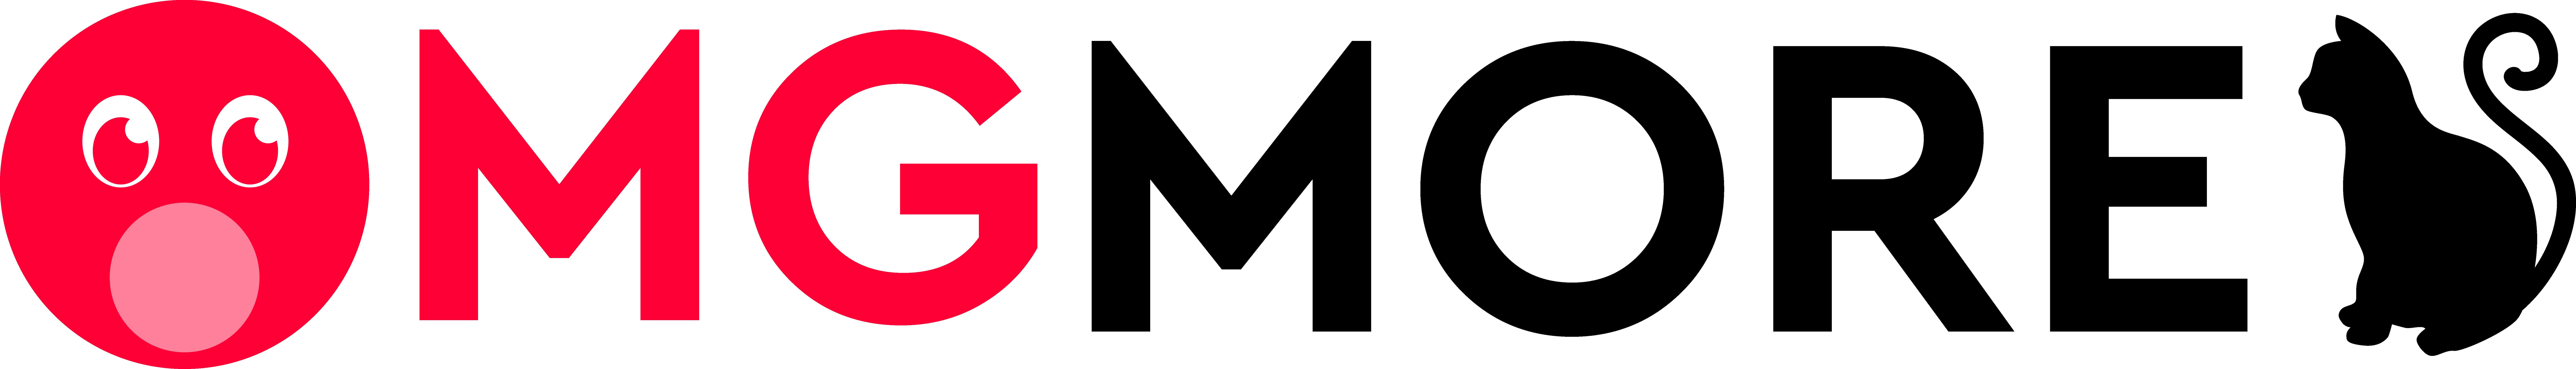 OMGMORE